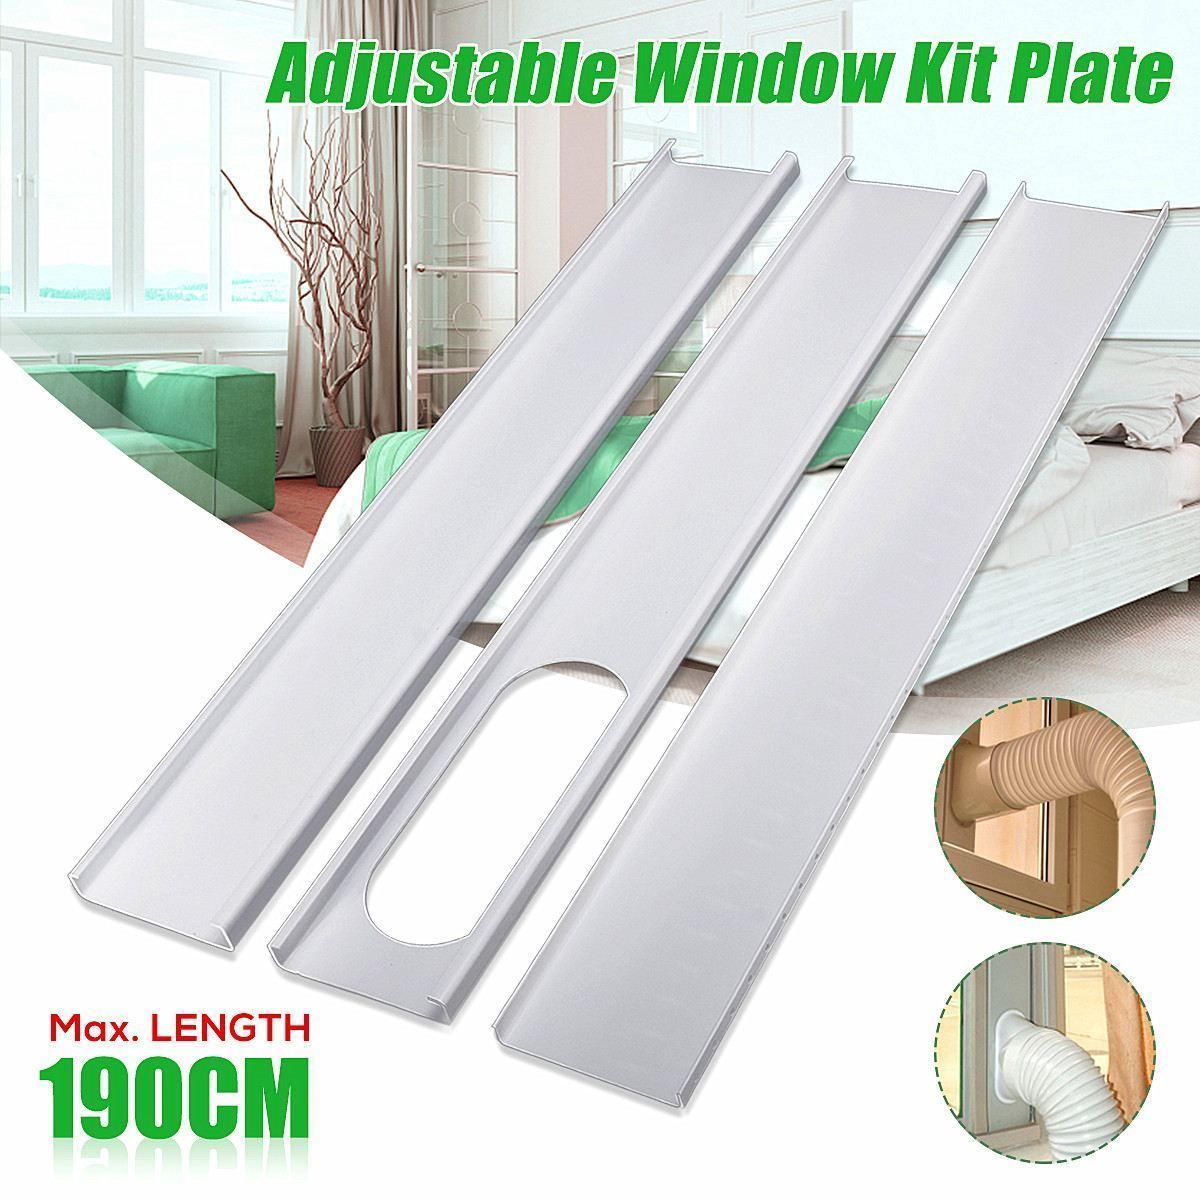 3pcs Adjustable 190cm Air Conditioner Window Slide Pvc Plate